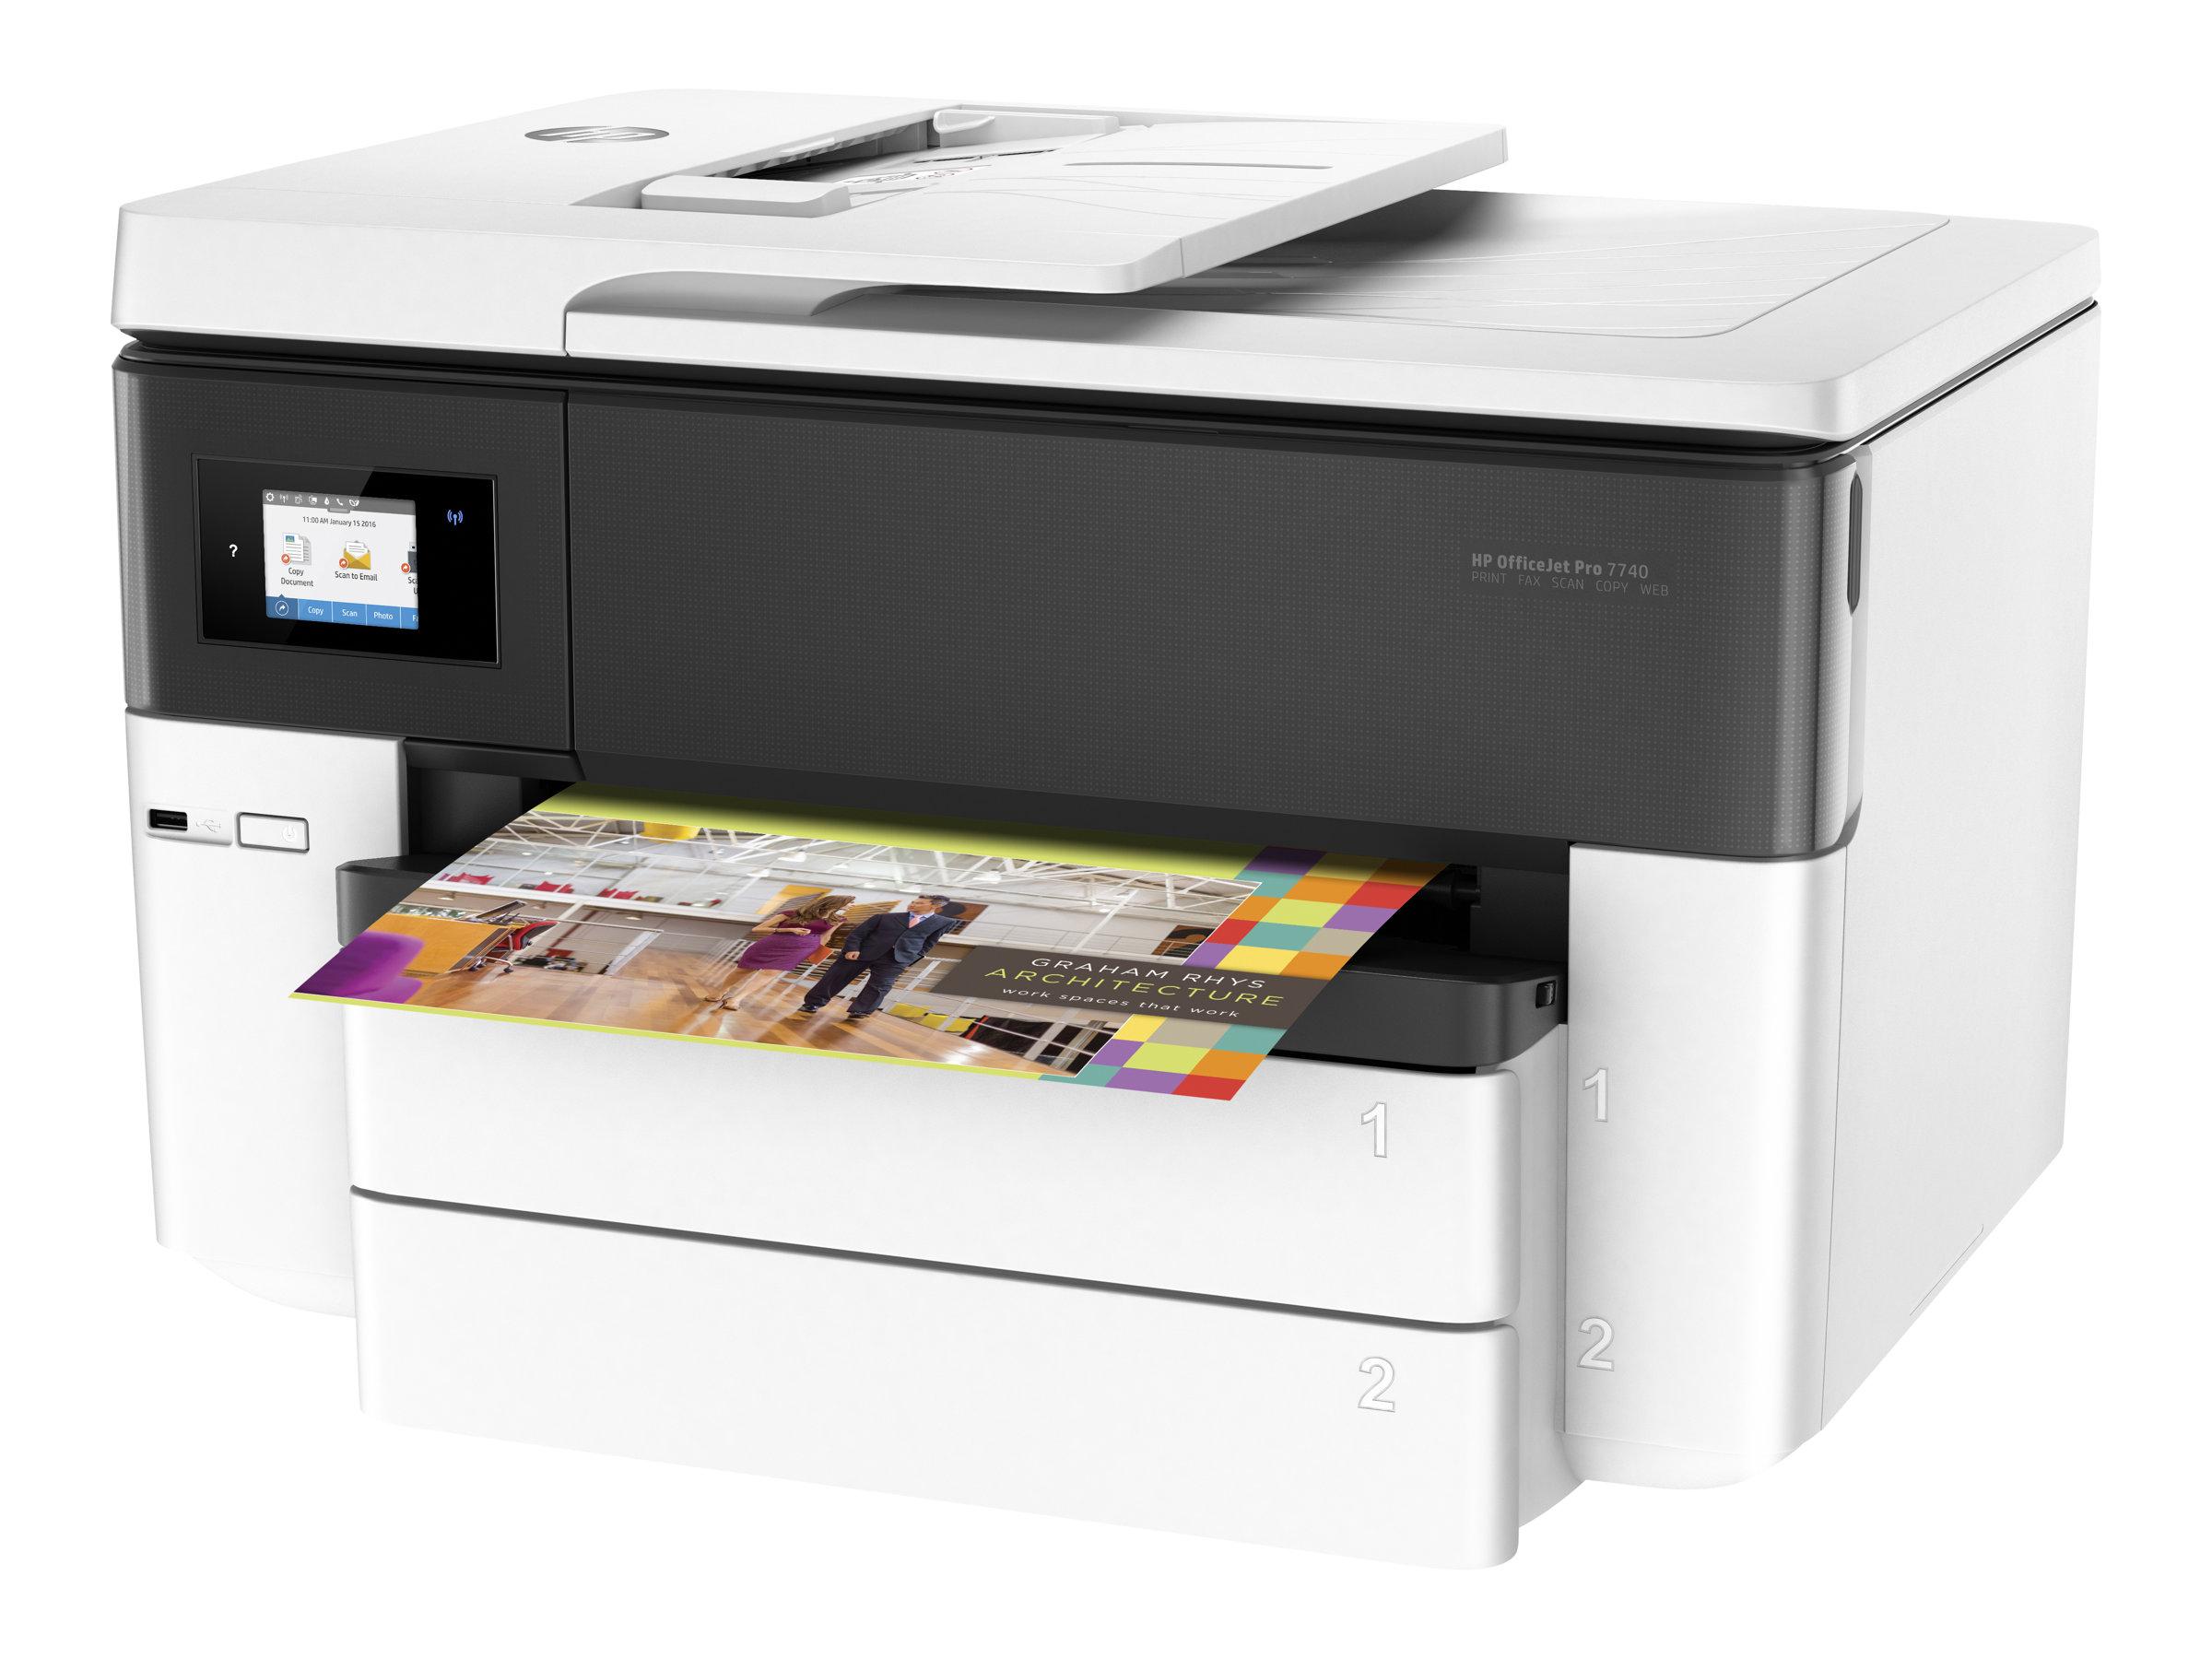 Hp officejet pro 7740 all in one multifunktionsdrucker farbe tintenstrahl a3 ledger 297 x 432 mm original a3 medien 6187483 g5j38a a80